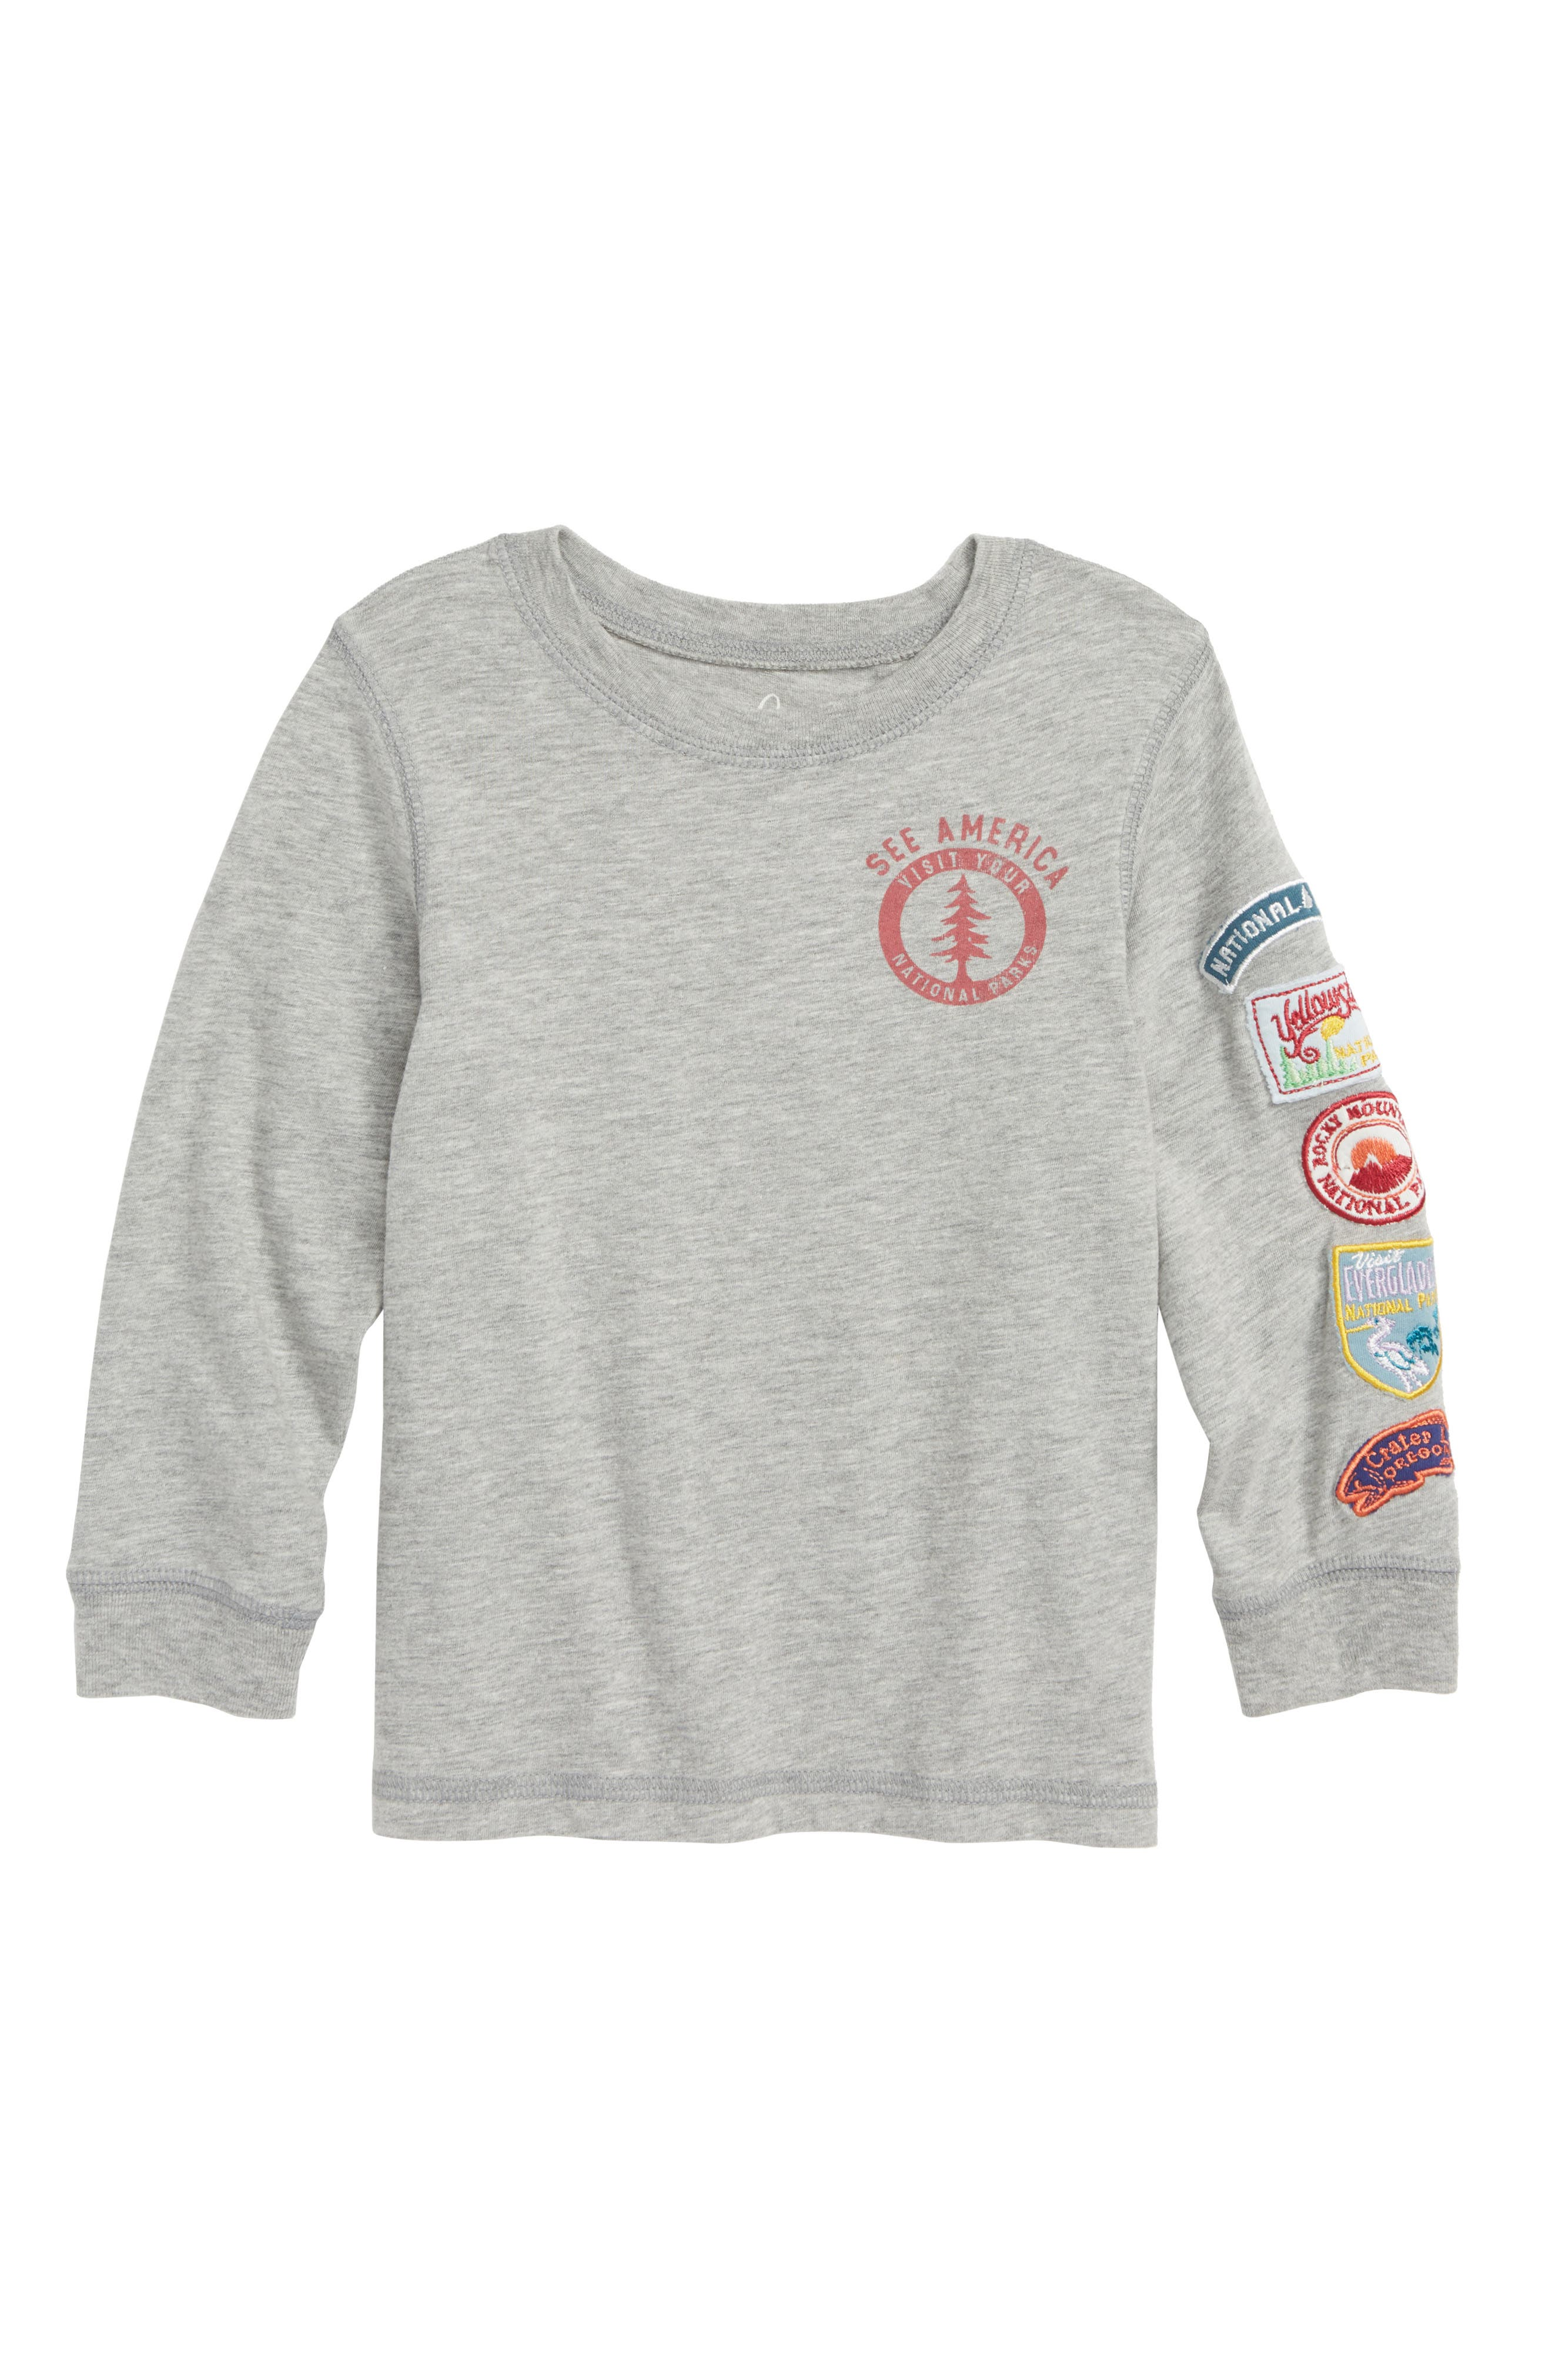 See America Graphic T-Shirt,                             Main thumbnail 1, color,                             051